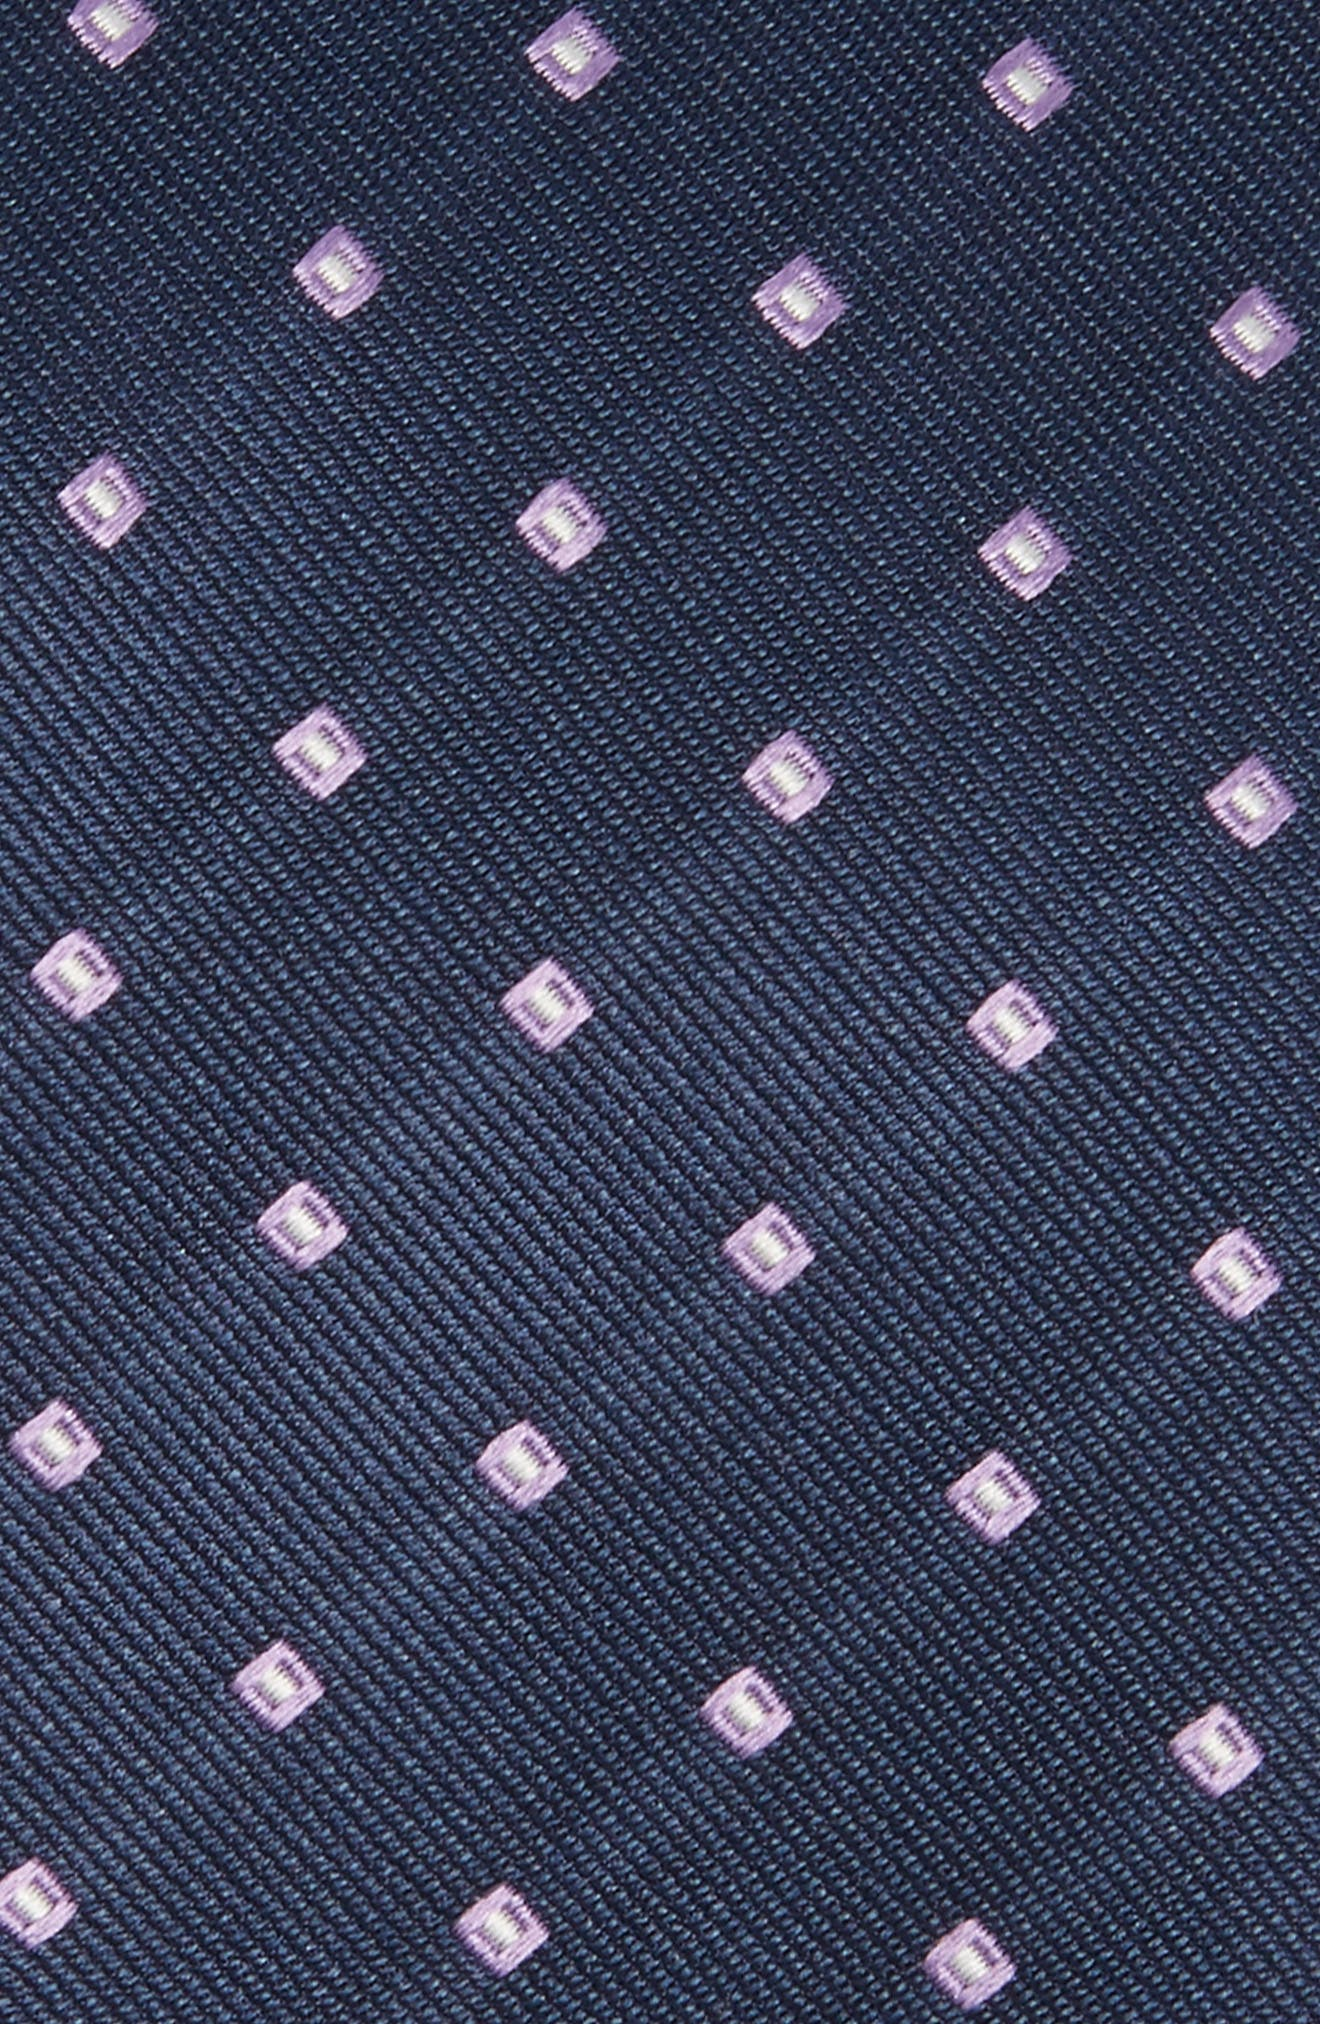 Medallion Silk Tie,                             Alternate thumbnail 8, color,